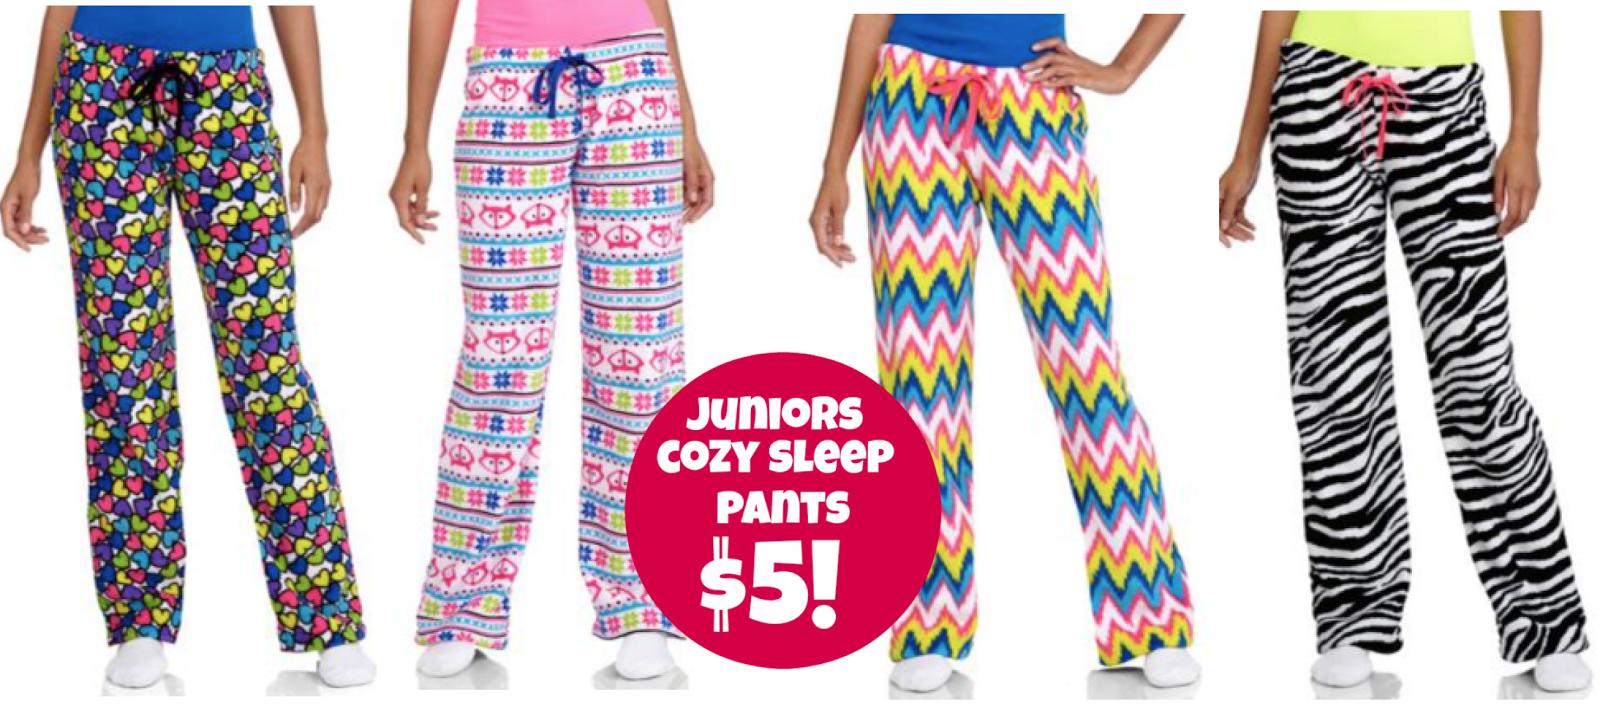 http://www.thebinderladies.com/2014/11/walmartcom-juniors-super-cozy-plush.html